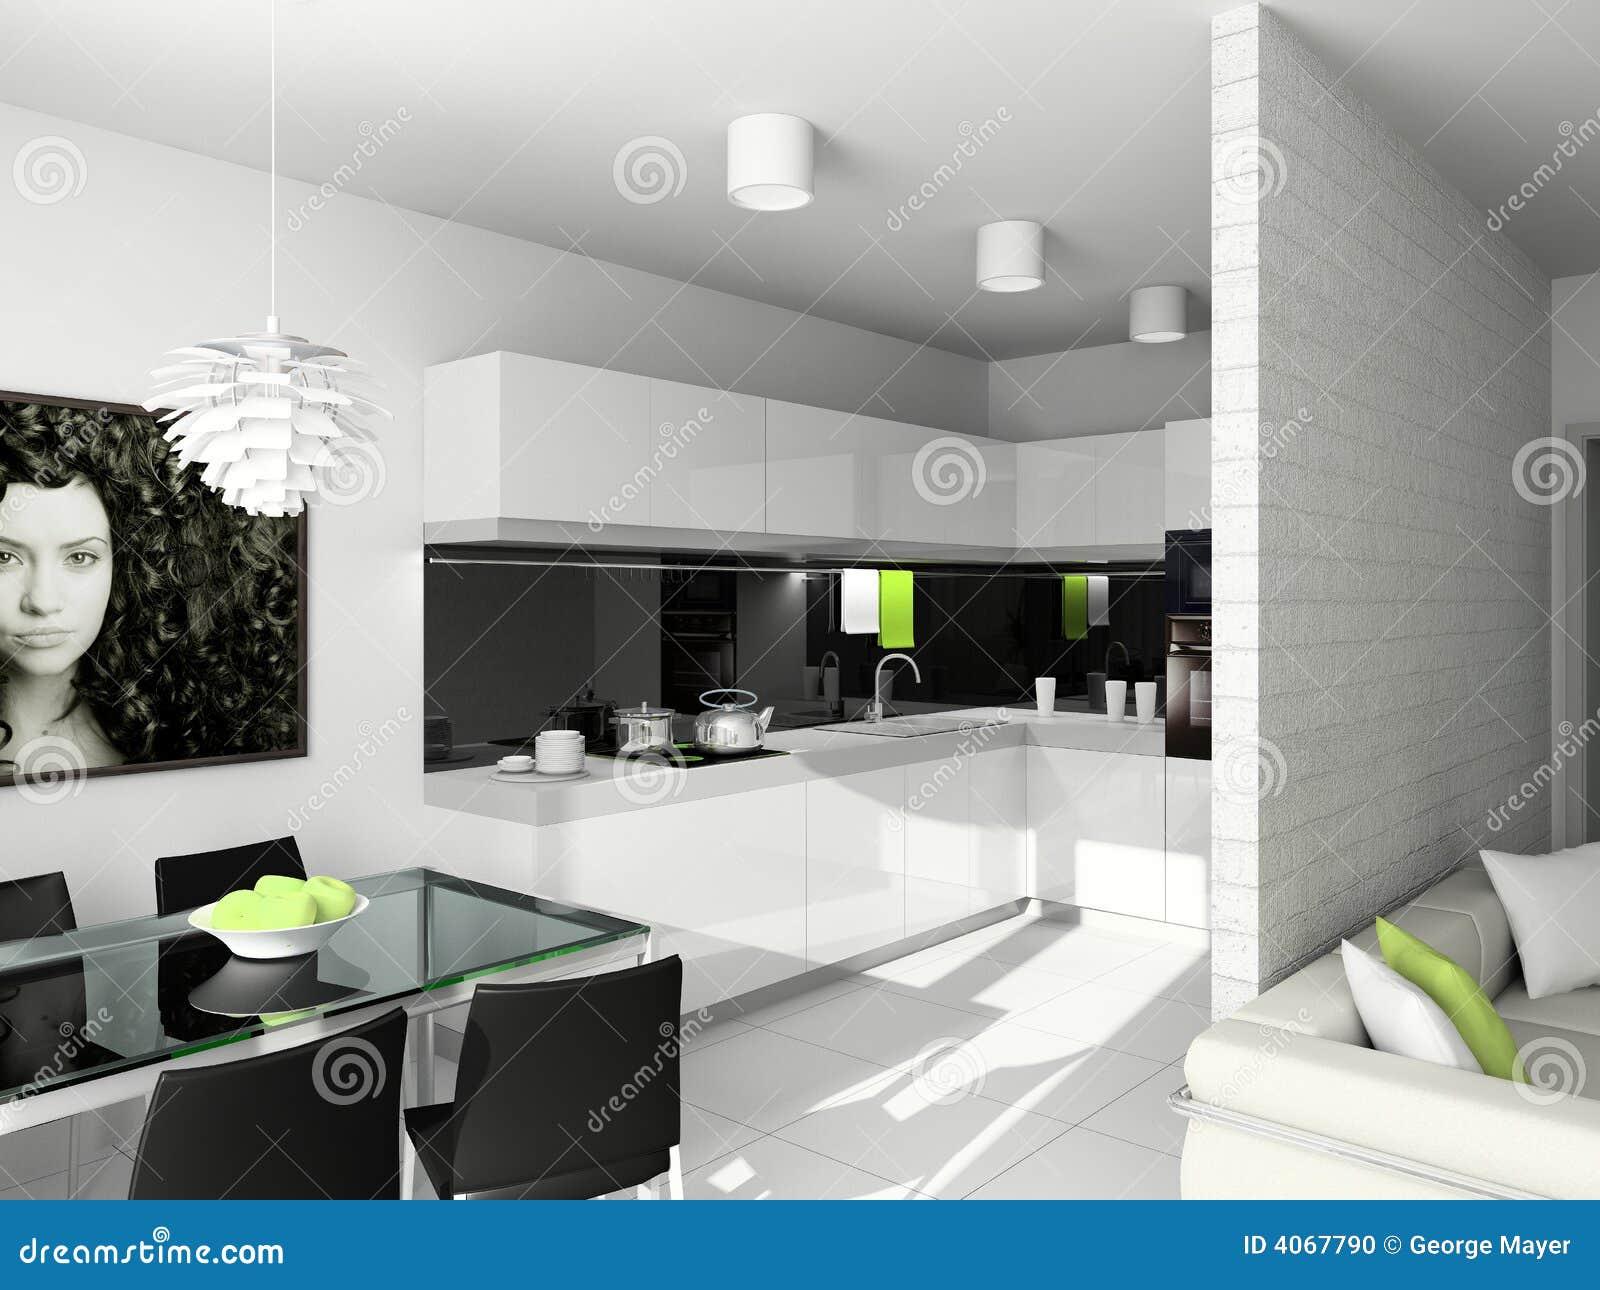 Modern design of interior